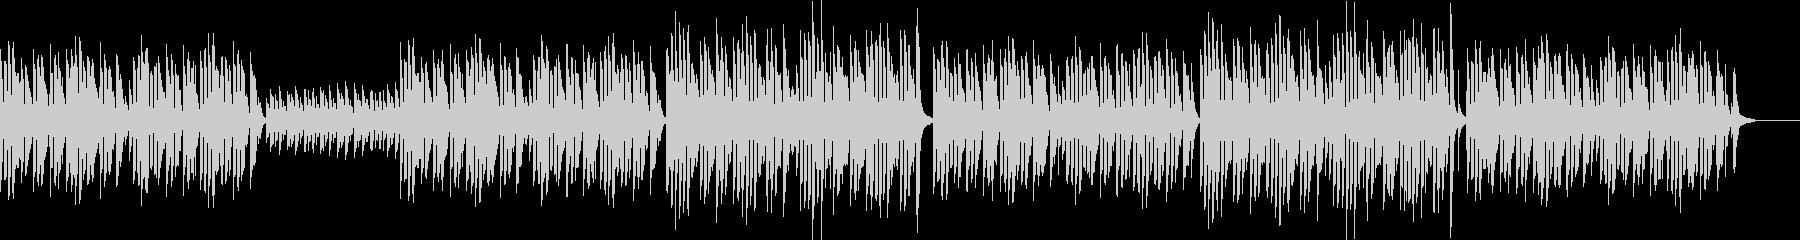 bpm096 キッズTikTok可愛い笛の未再生の波形